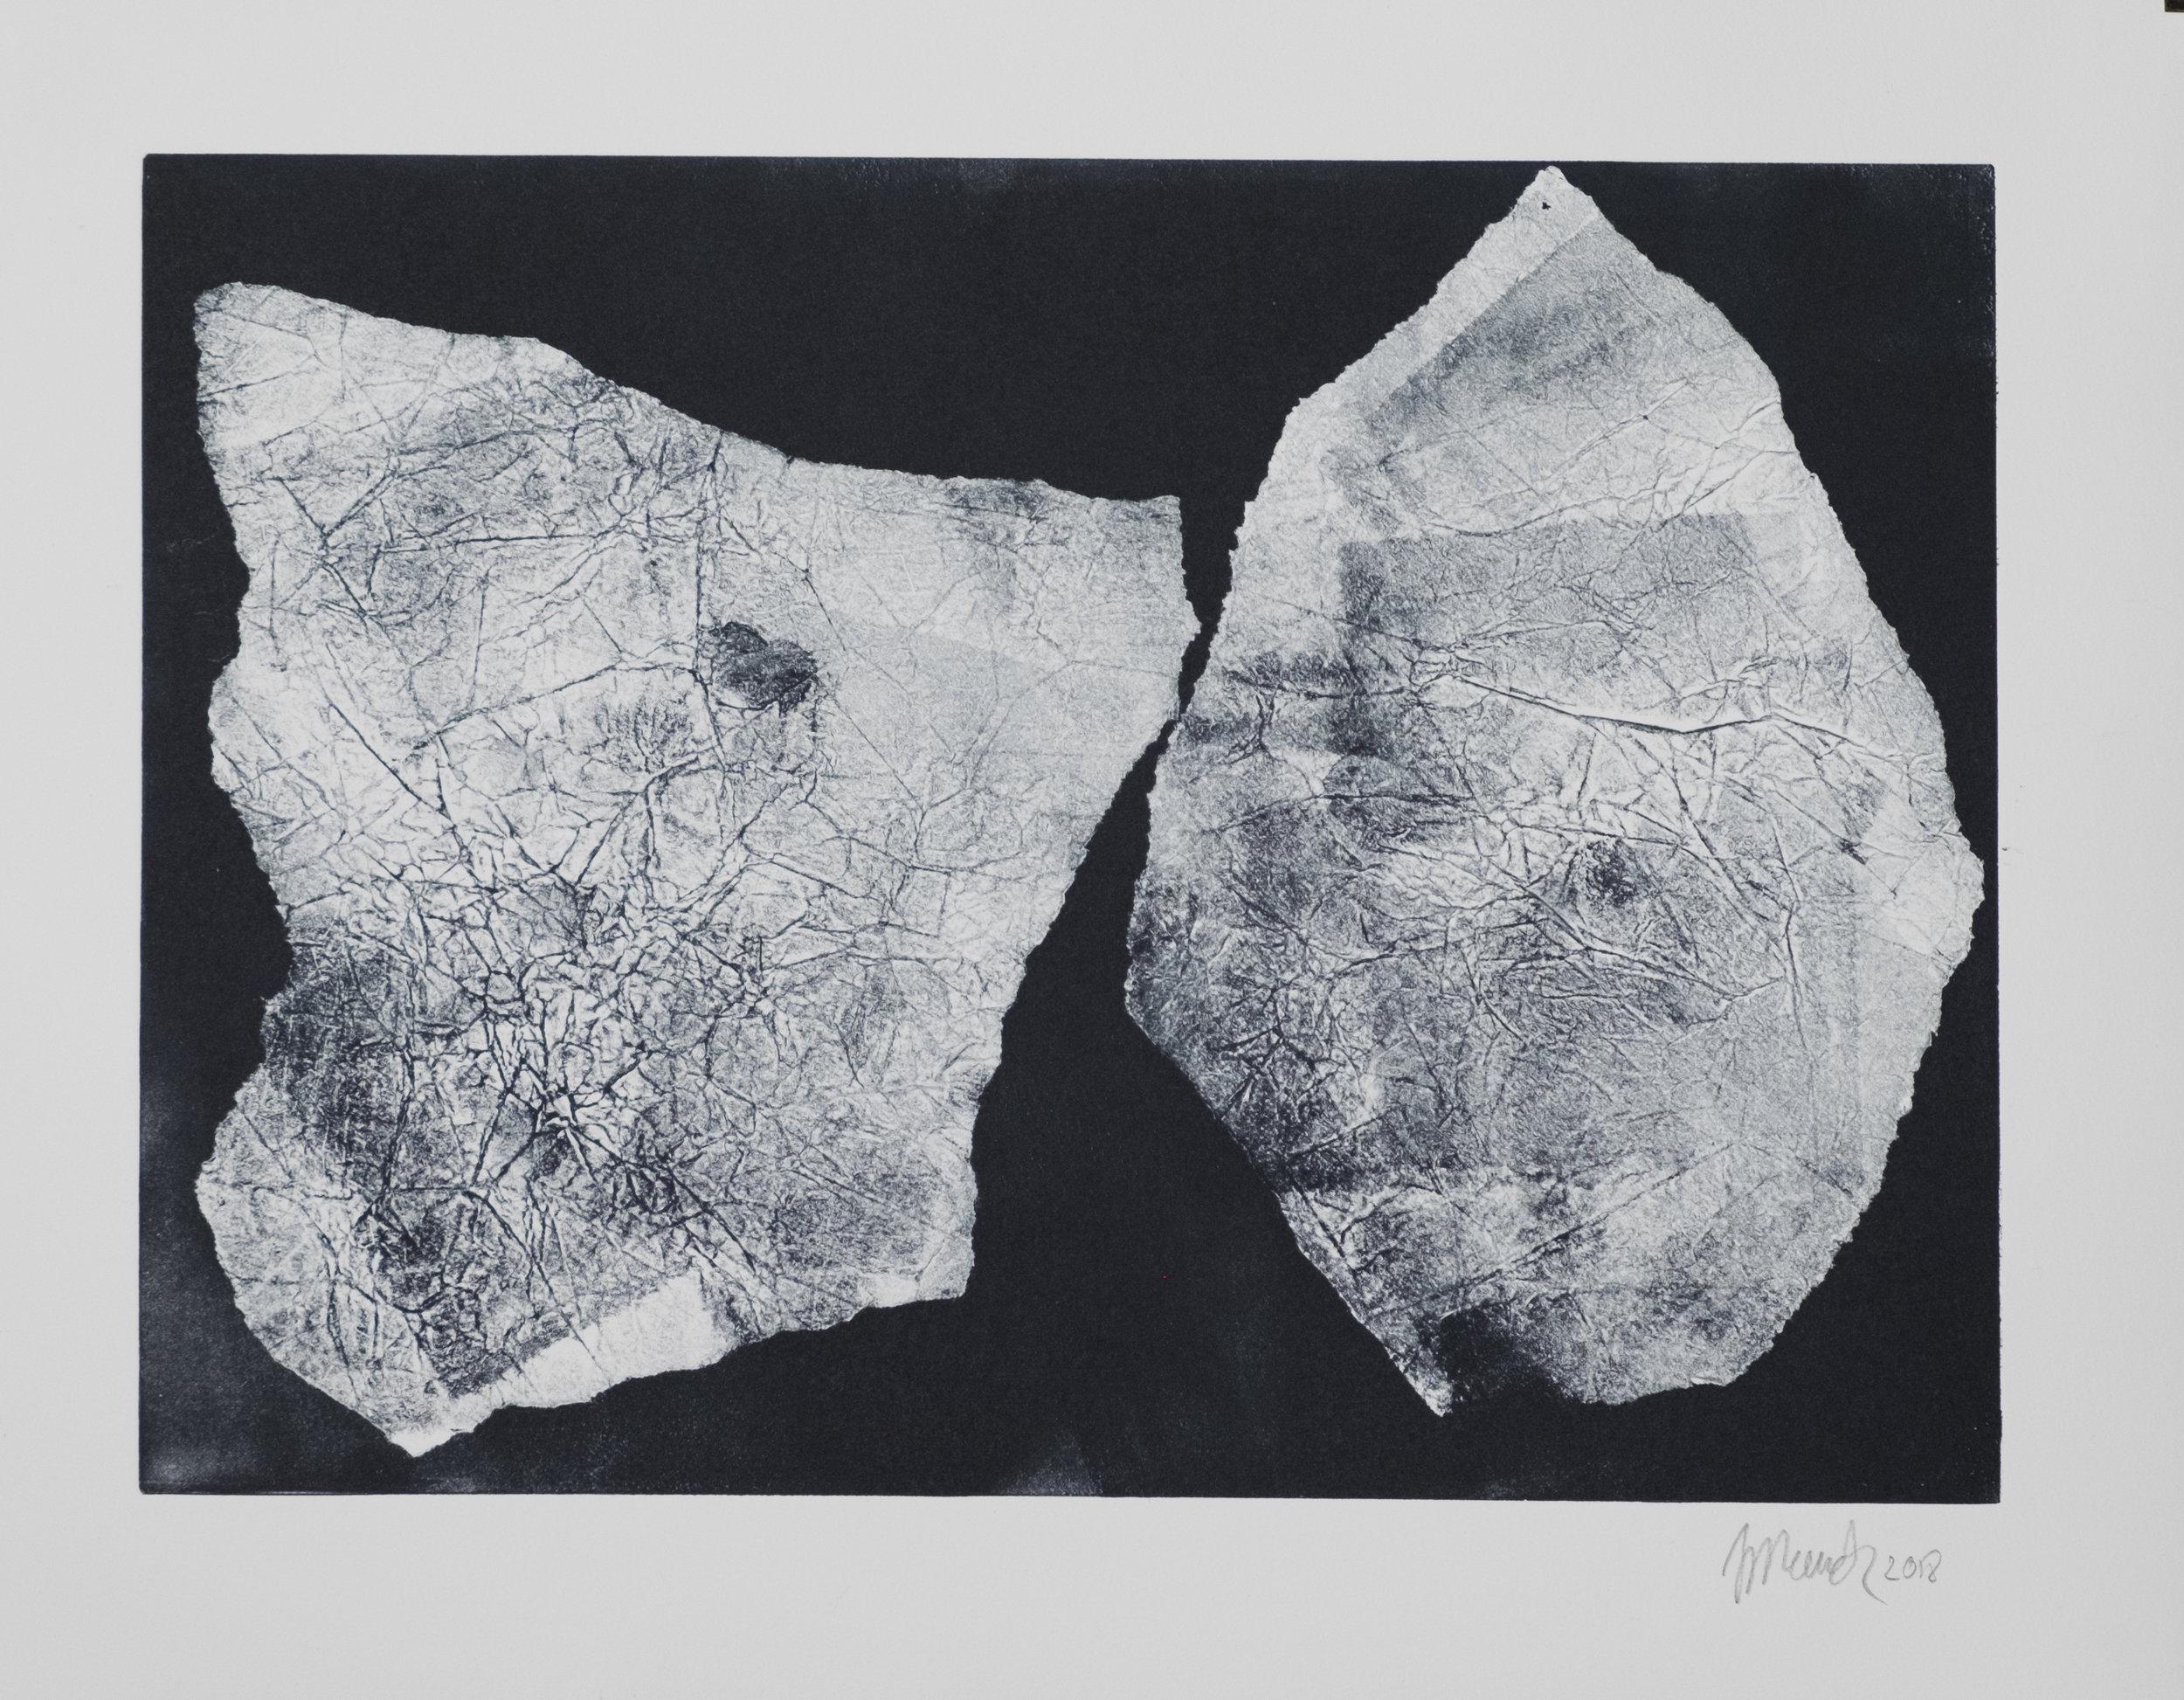 Forms on black 8 (34 cm x 24 cm)